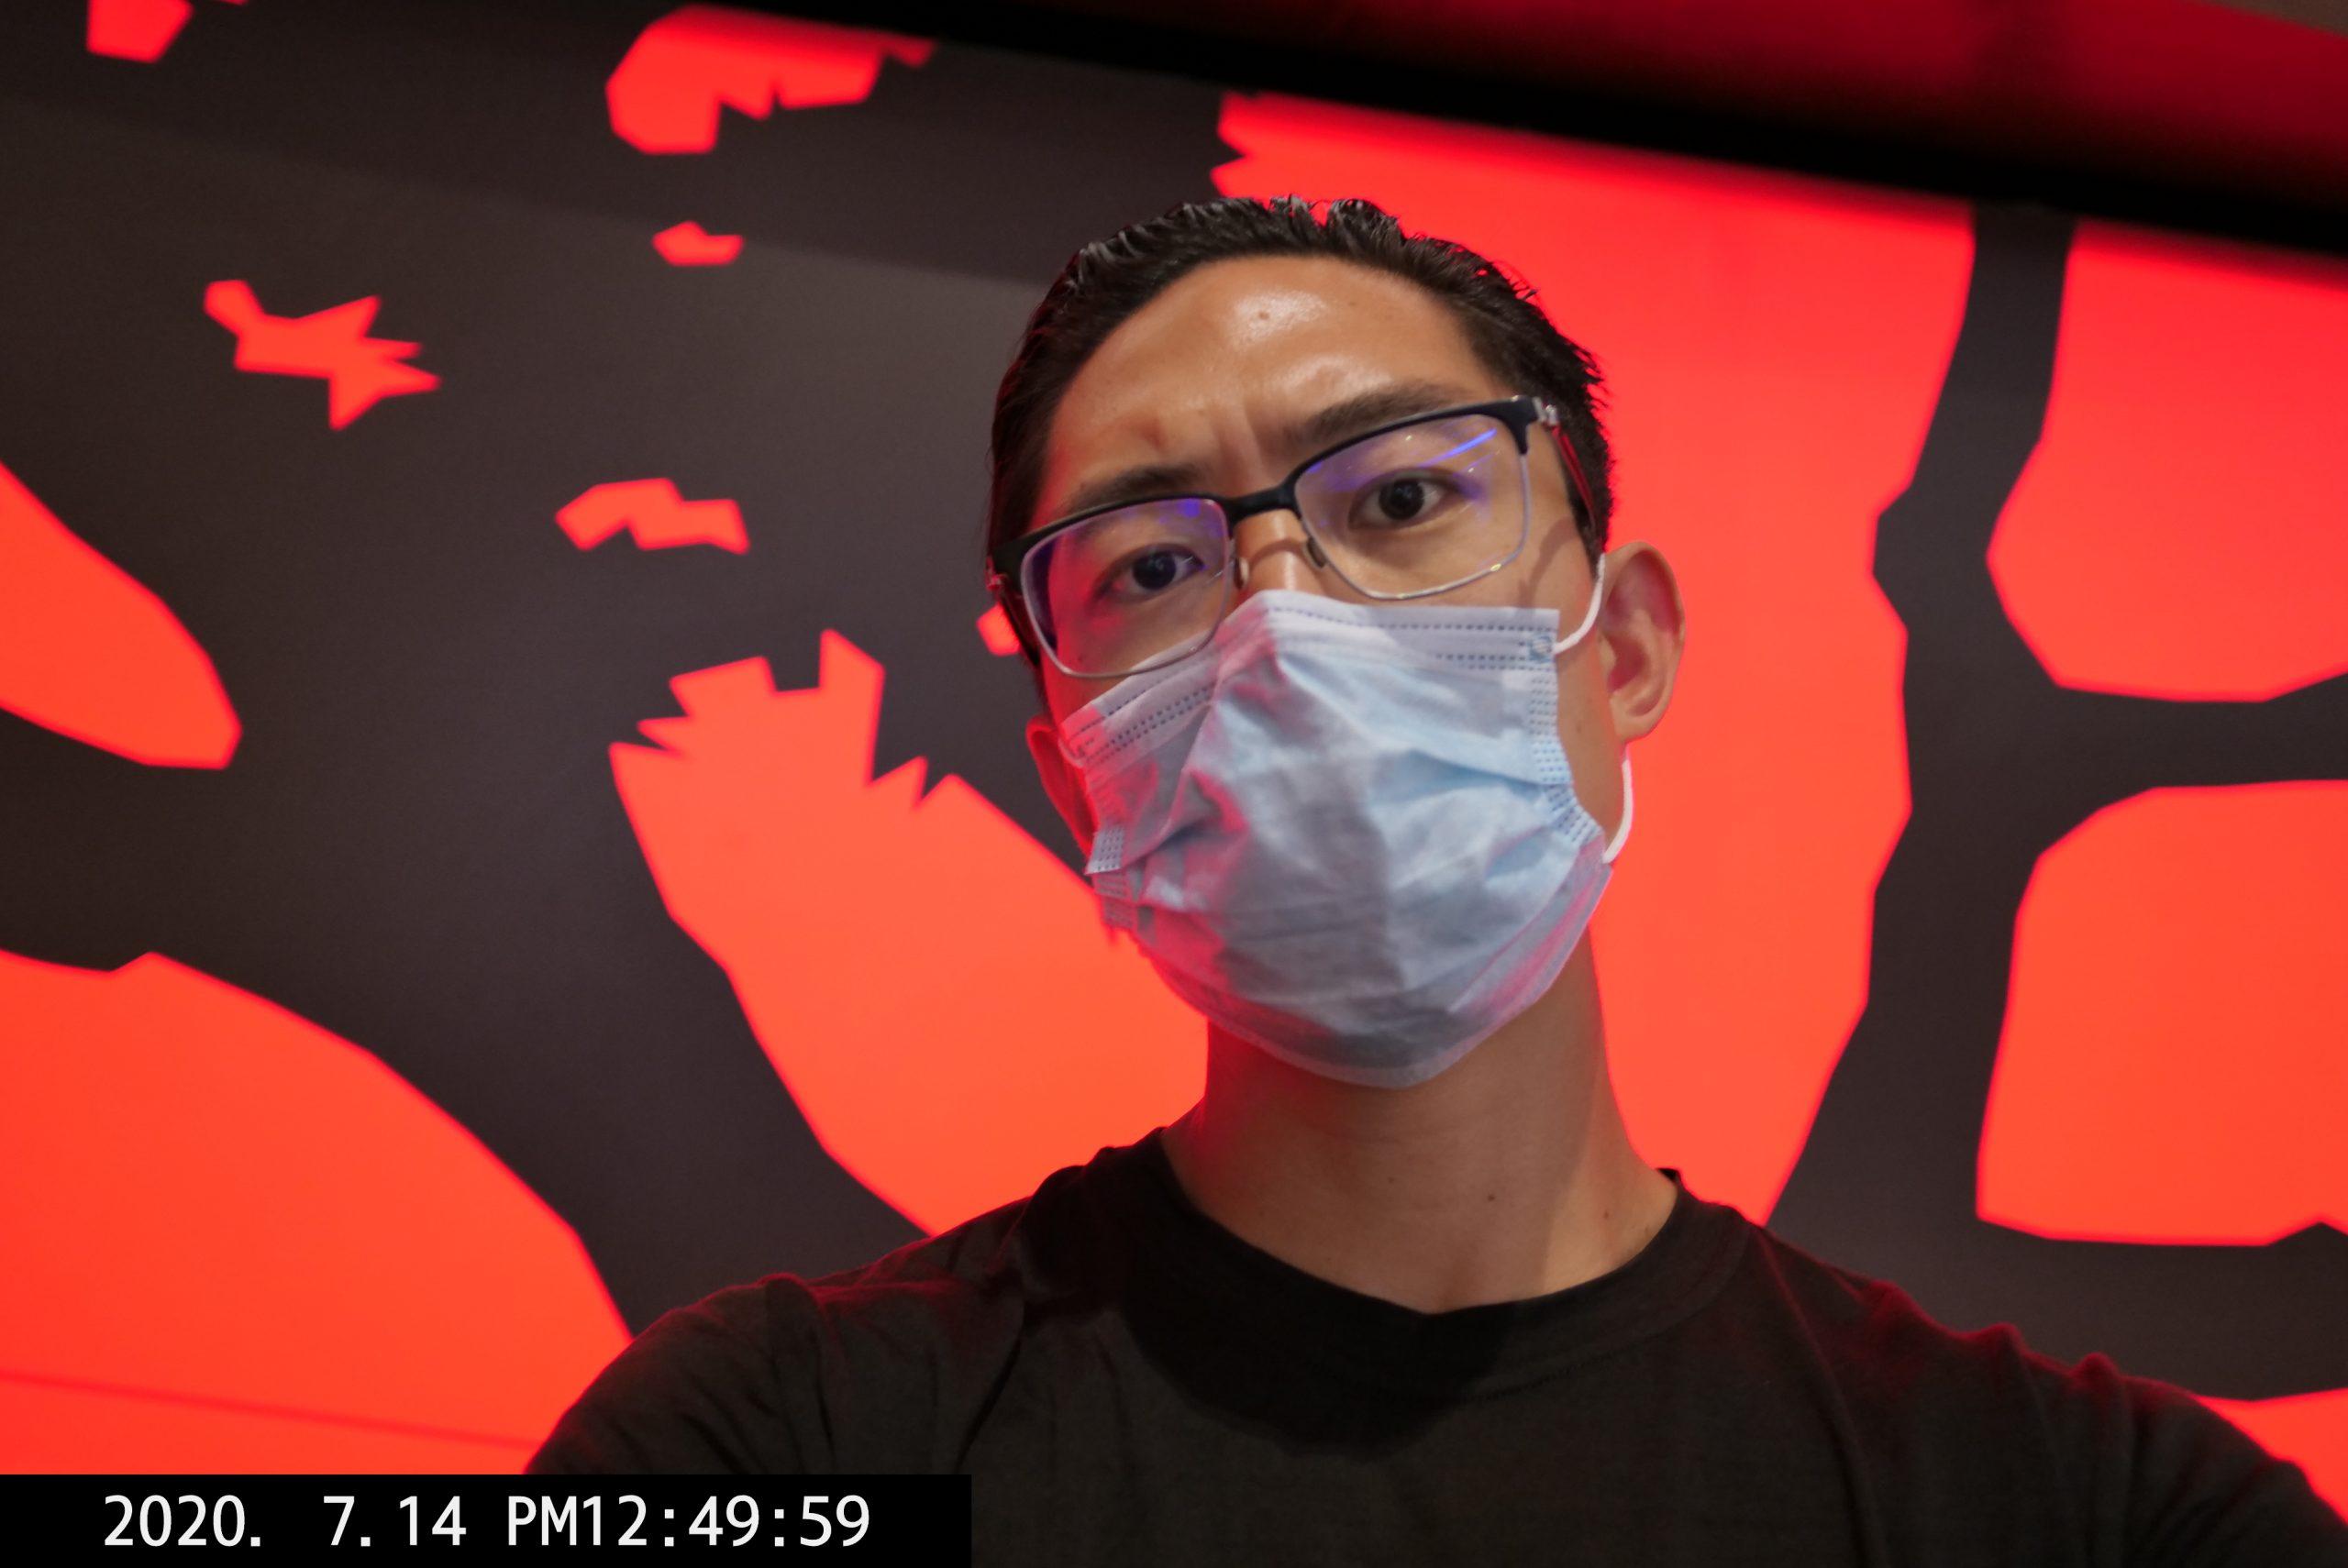 selfie face mask black blue red ERIC KIM lumix